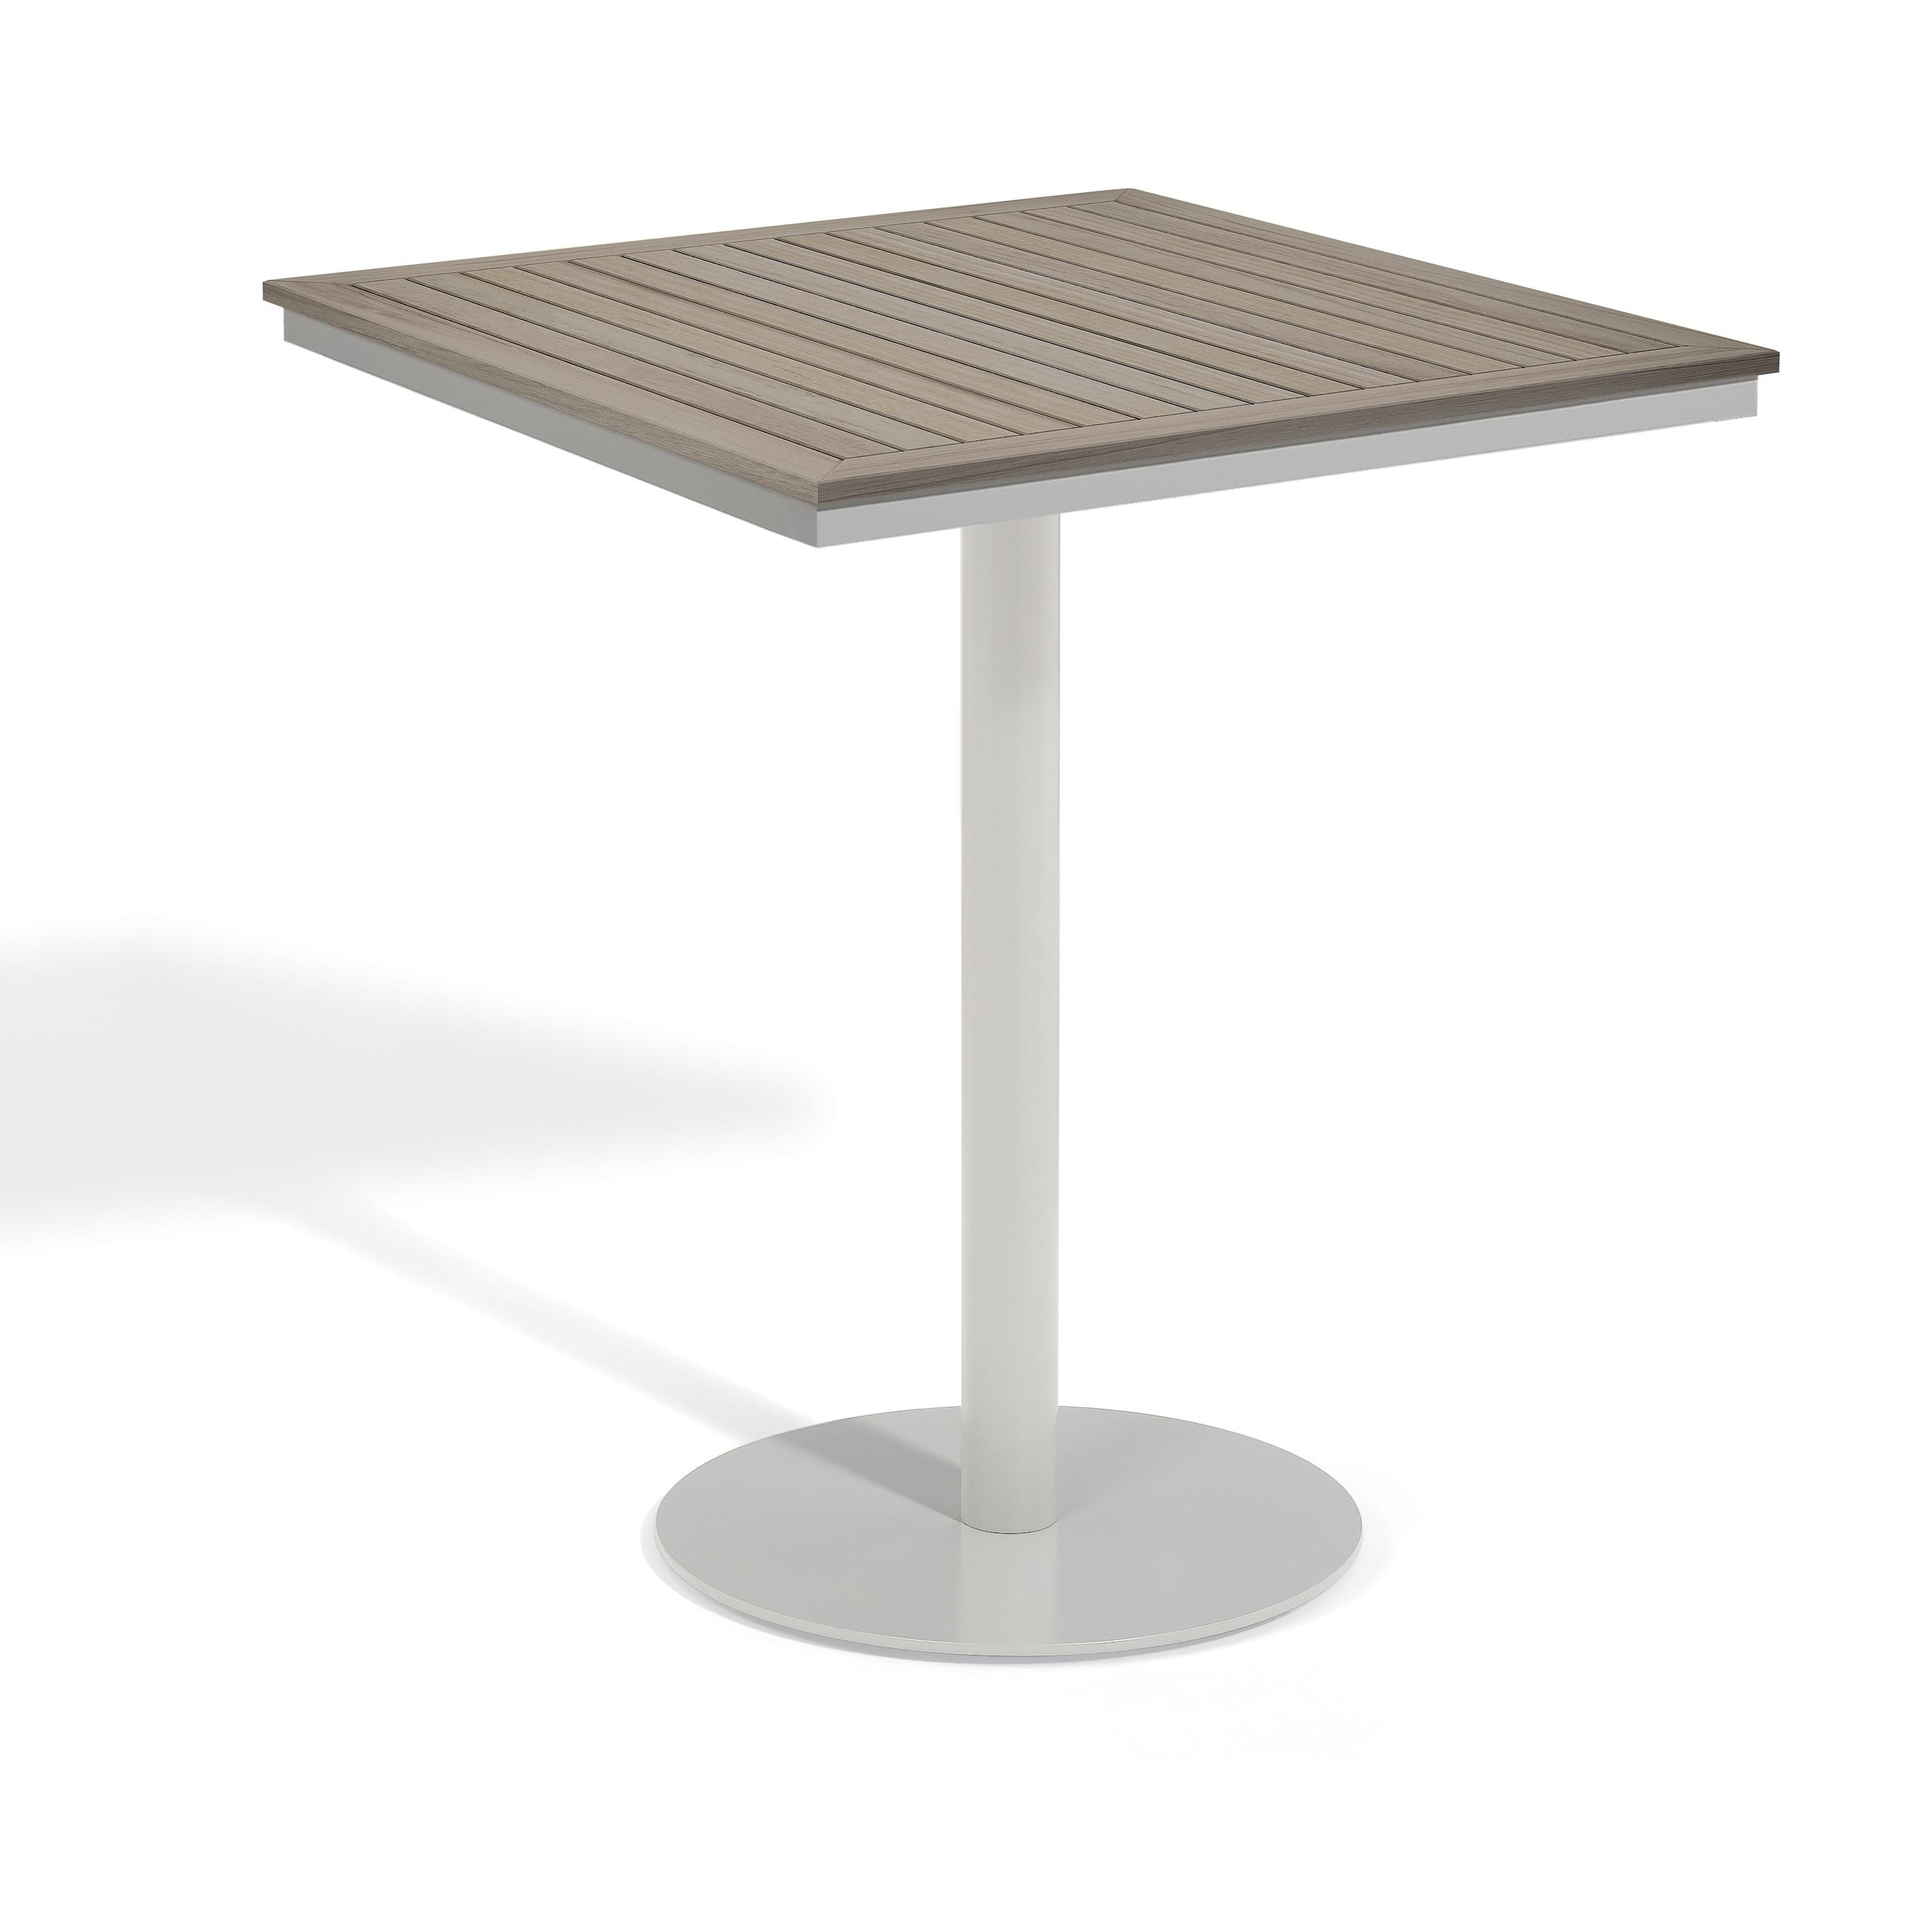 Oxford Garden Travira 36 inch Square Bar Table (Aluminum,...